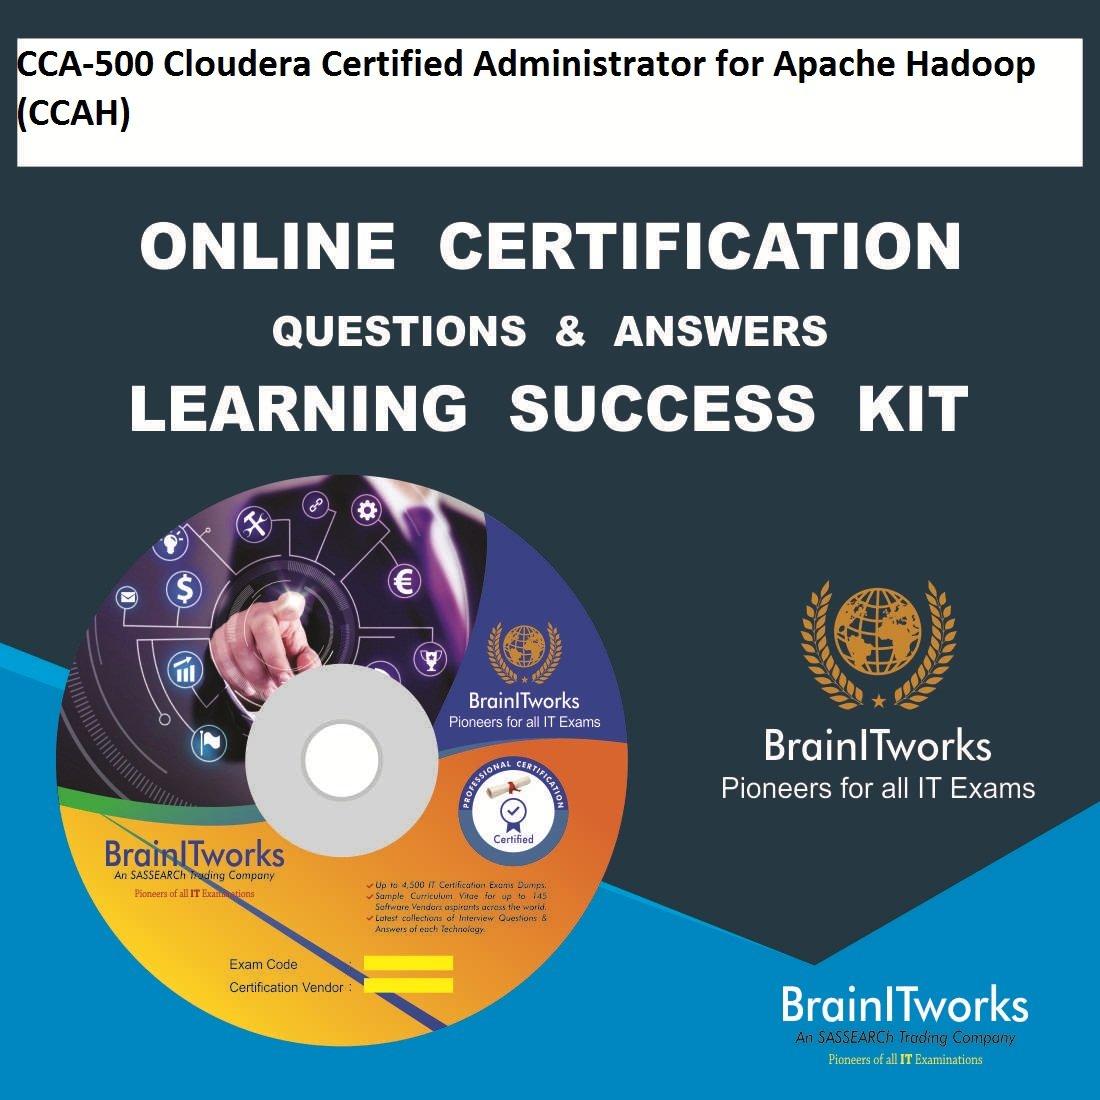 Cca 500 Cloudera Certified Administrator For Apache Hadoop Ccah